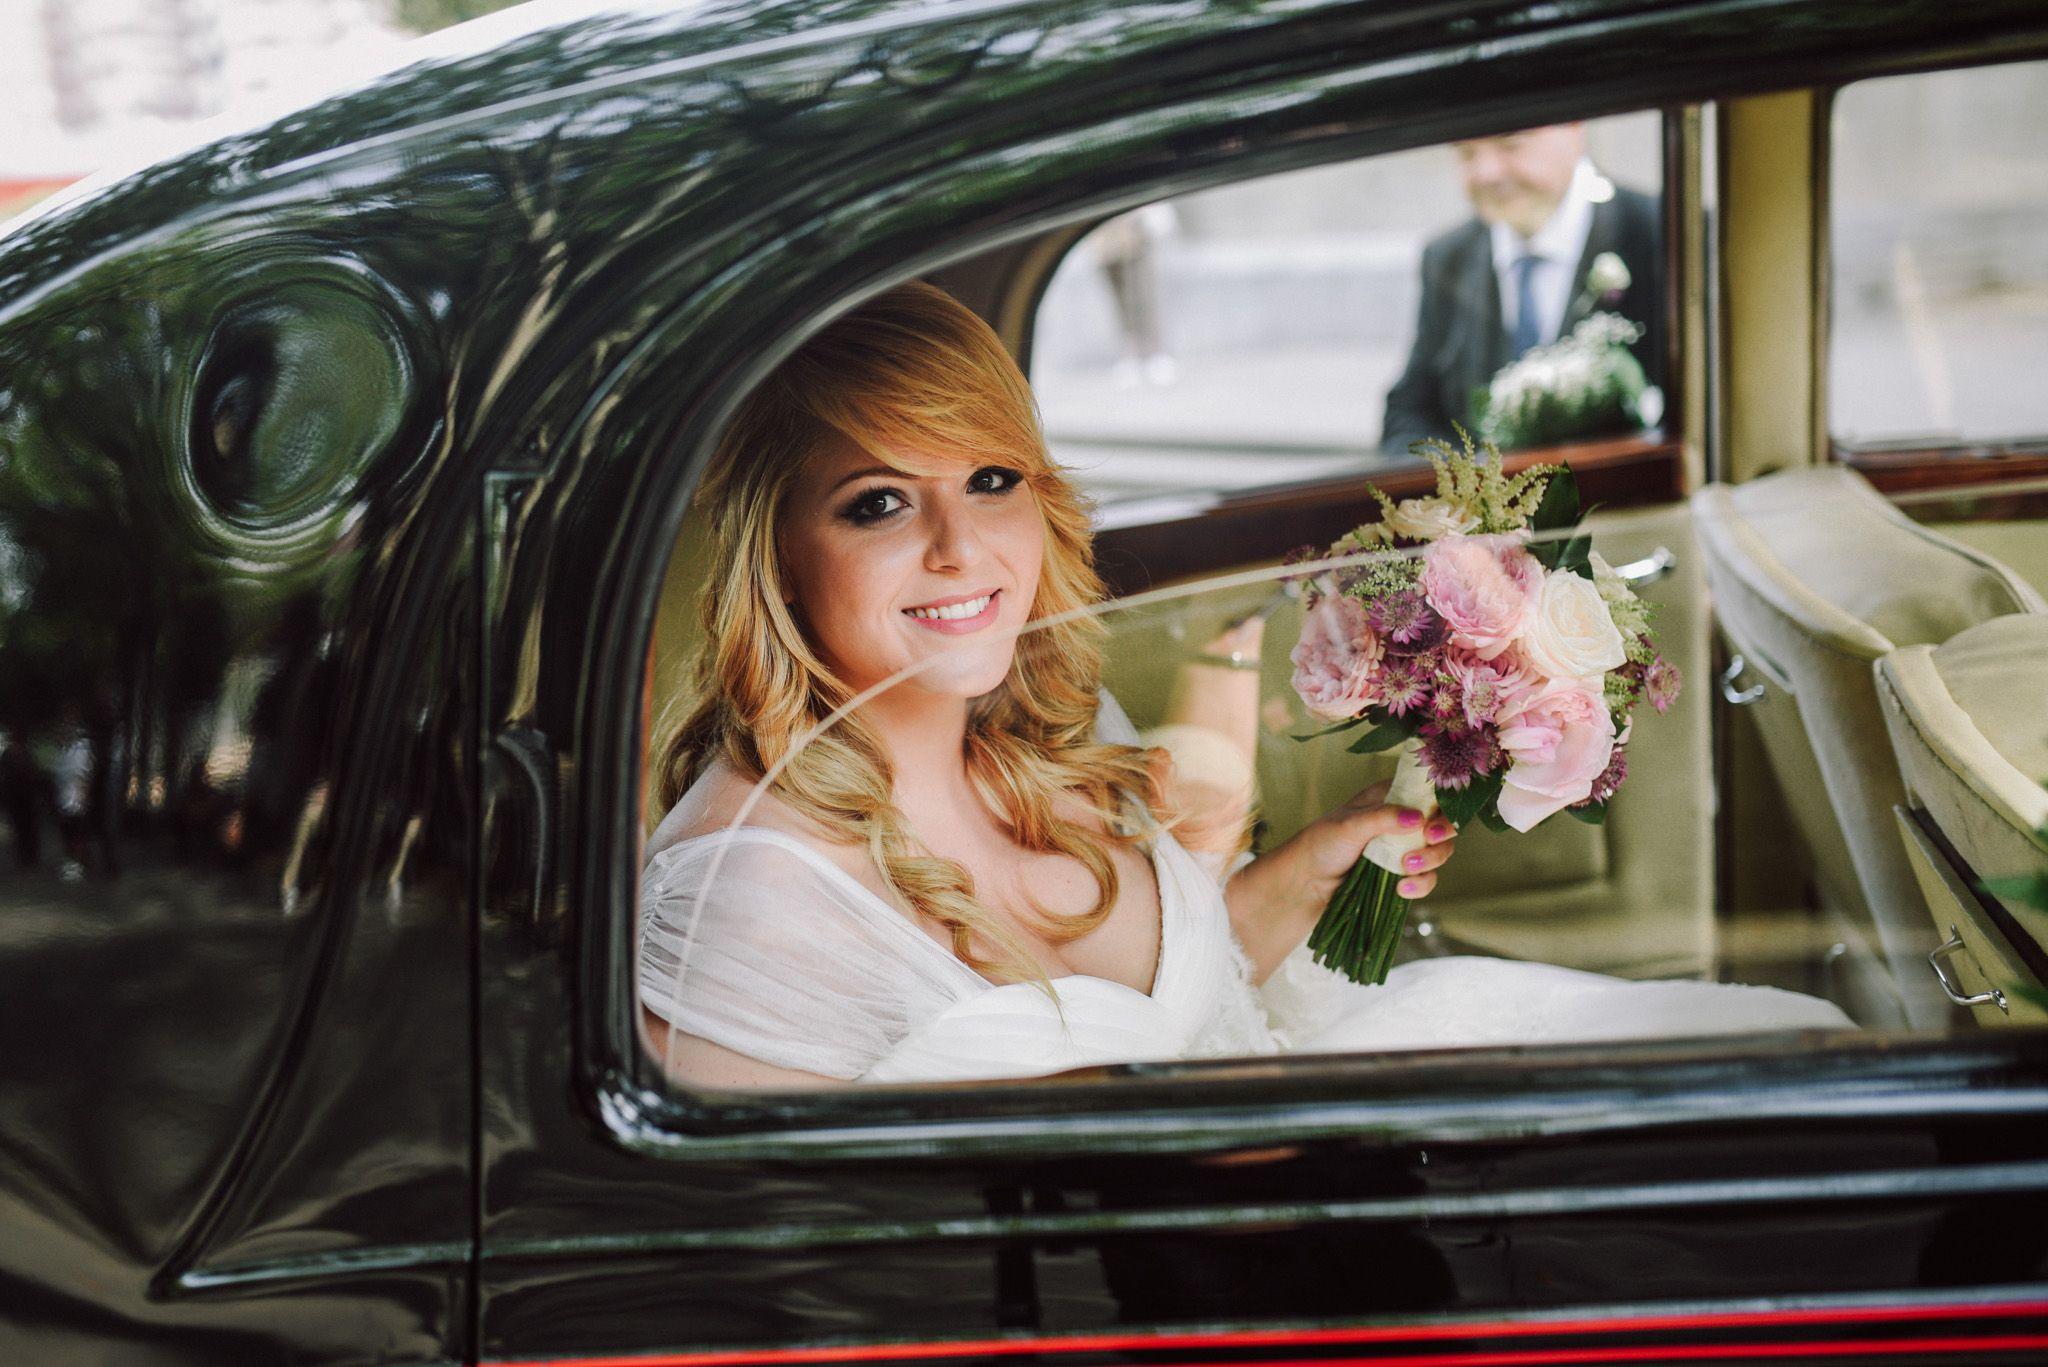 Llegada de la novia a la Basílica de Begoña de Bilbao en Rolls Royce